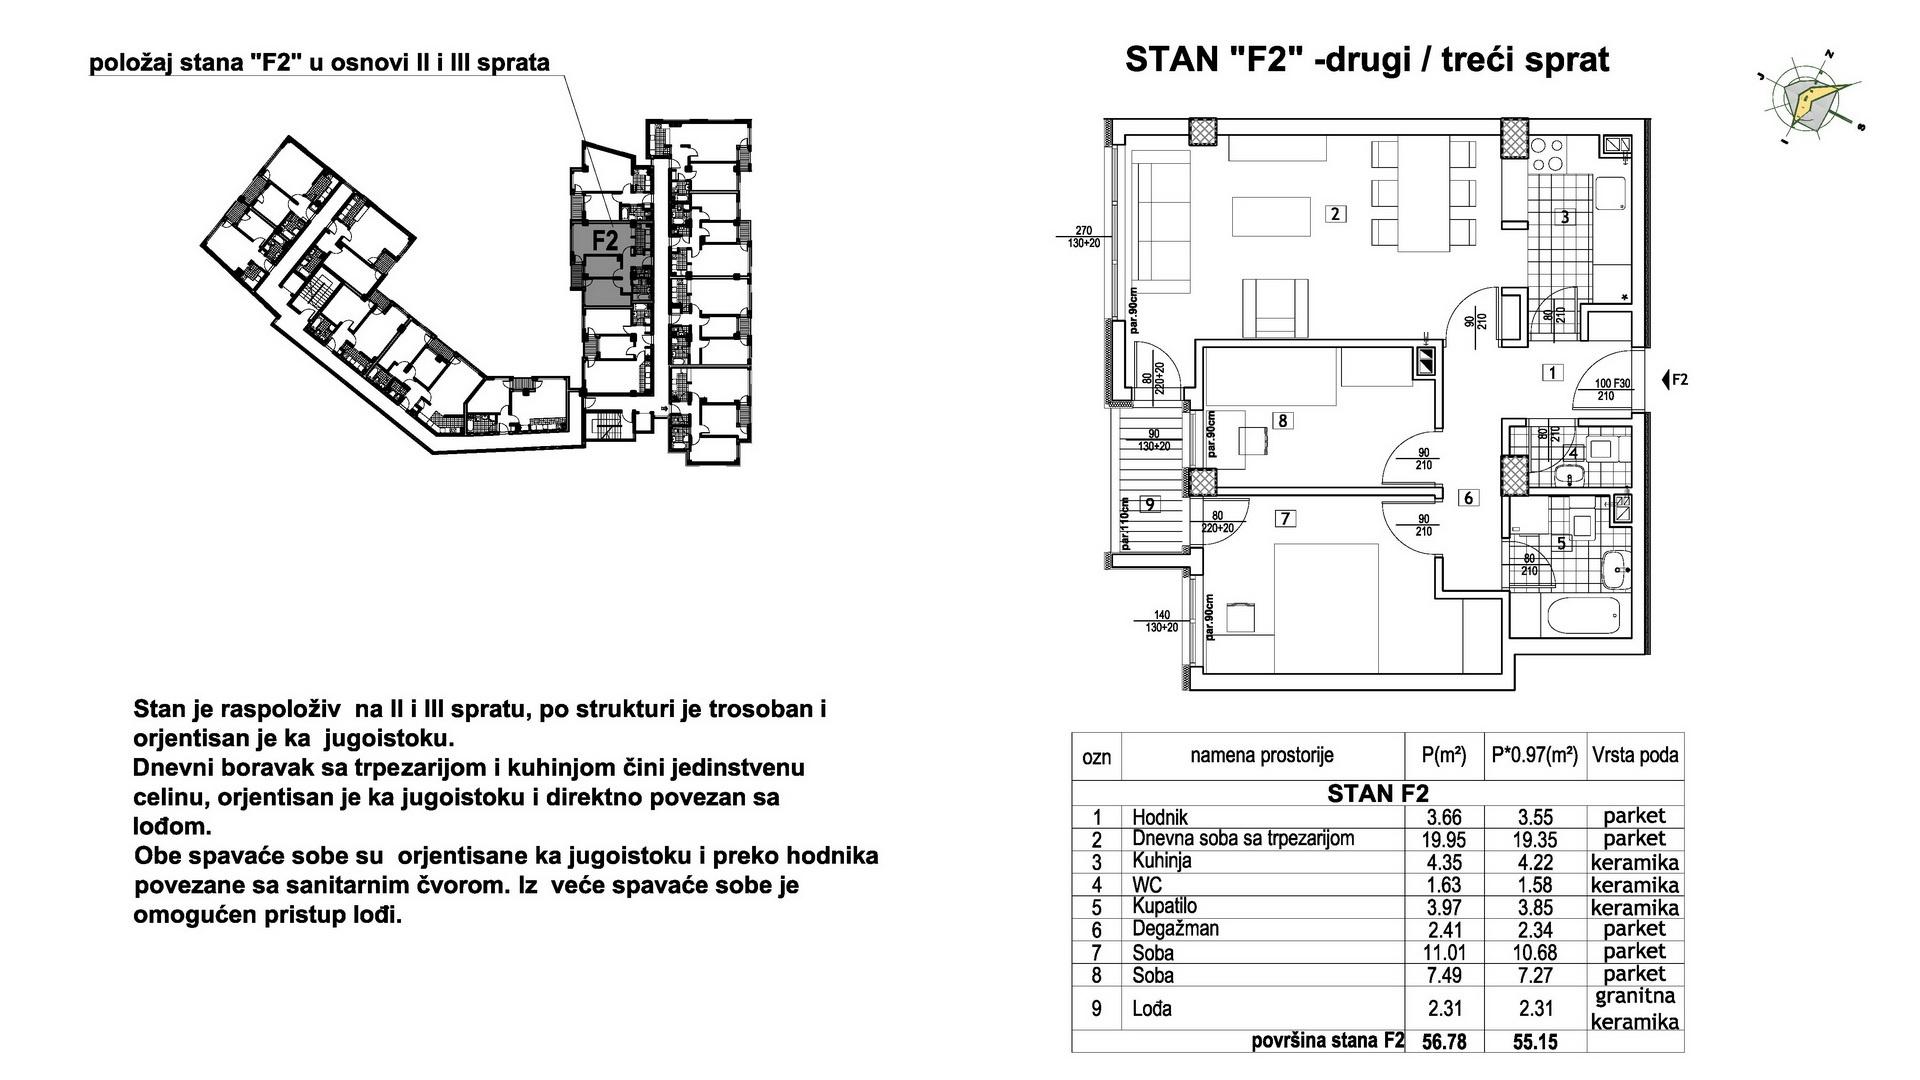 Objekat u Prešernovoj bb - Stan F2